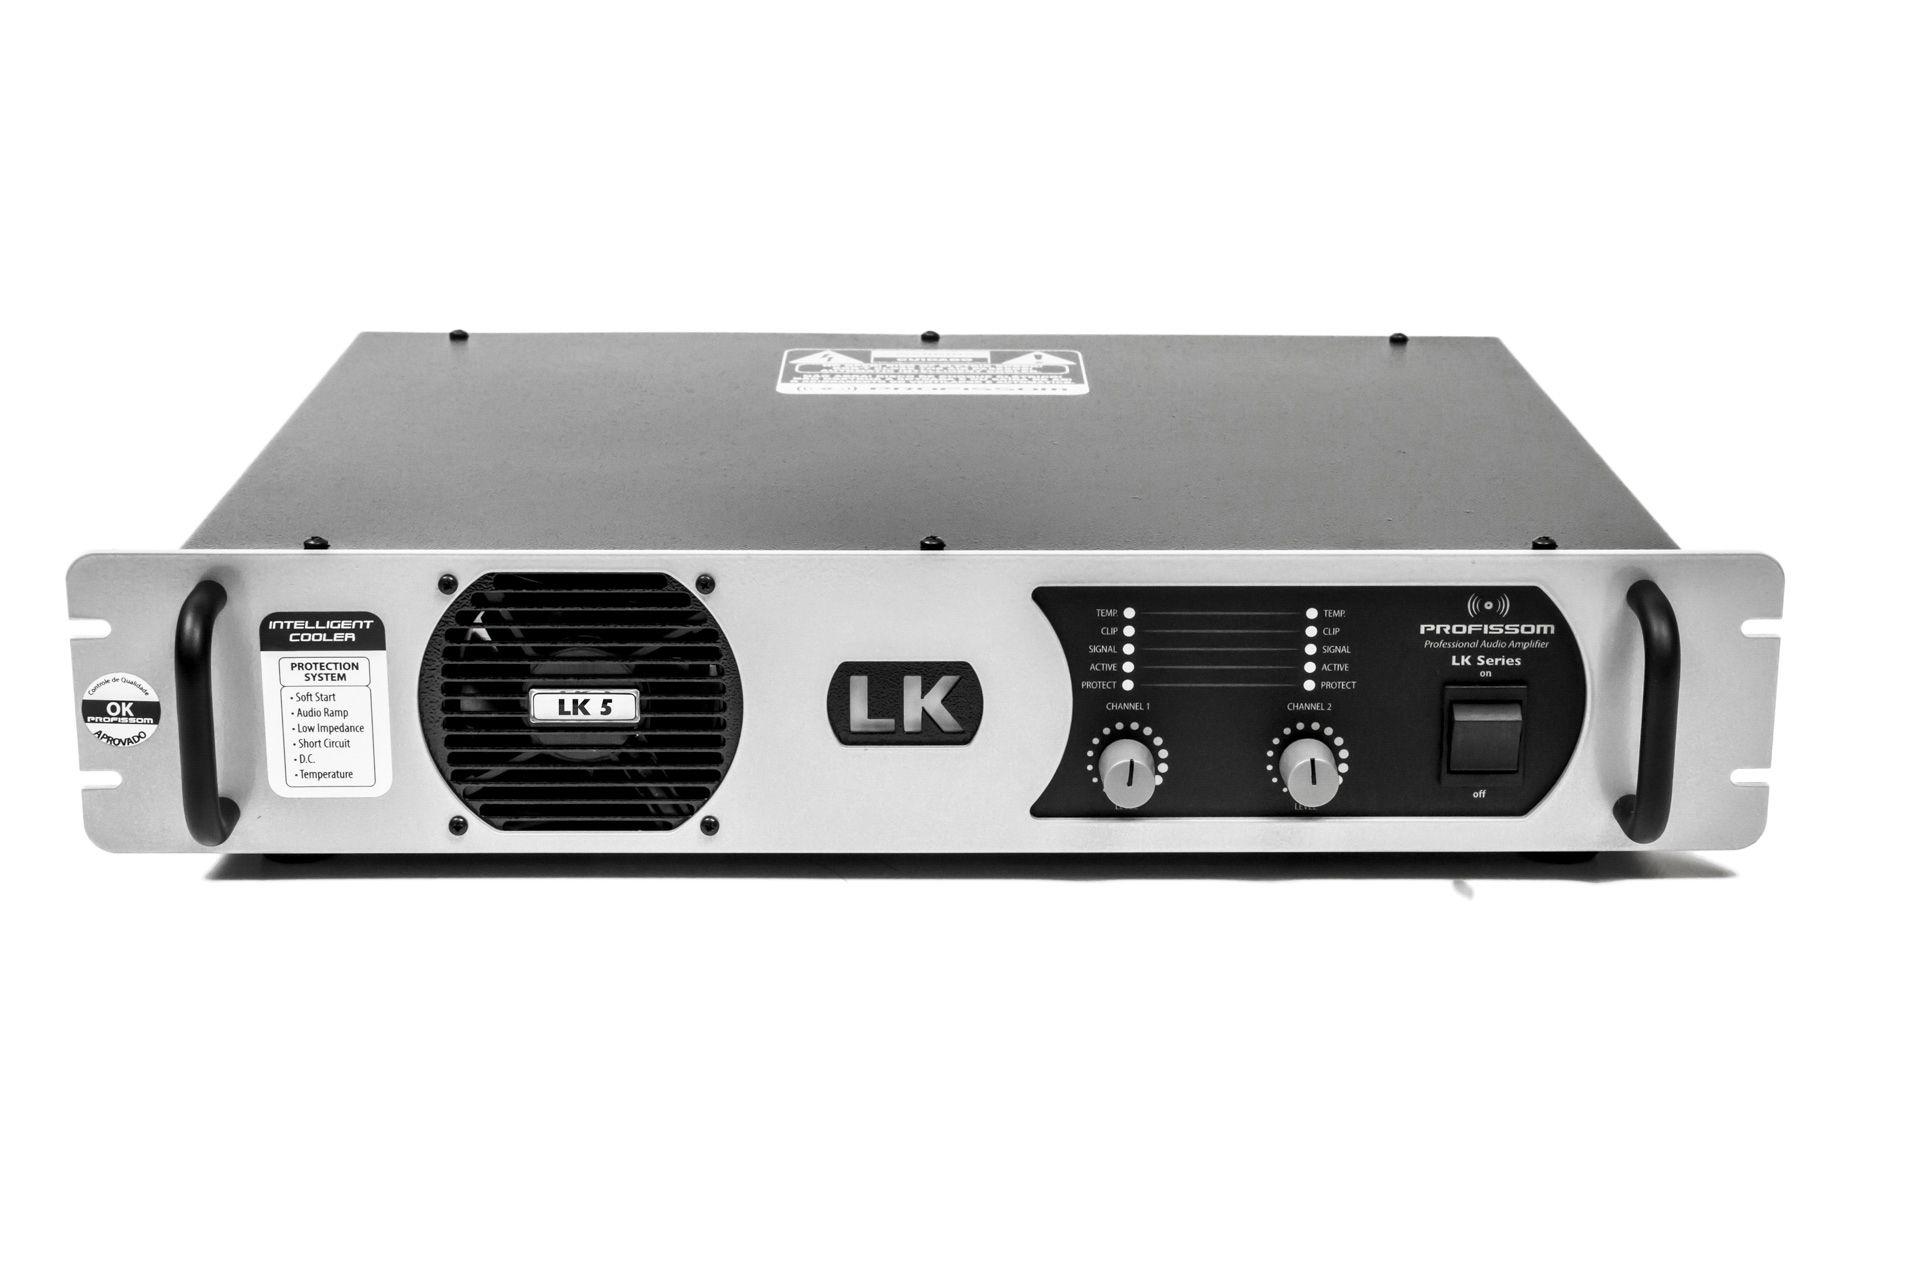 Amplificador Profissom LK 5 (1.100 W rms · 4 ohms)